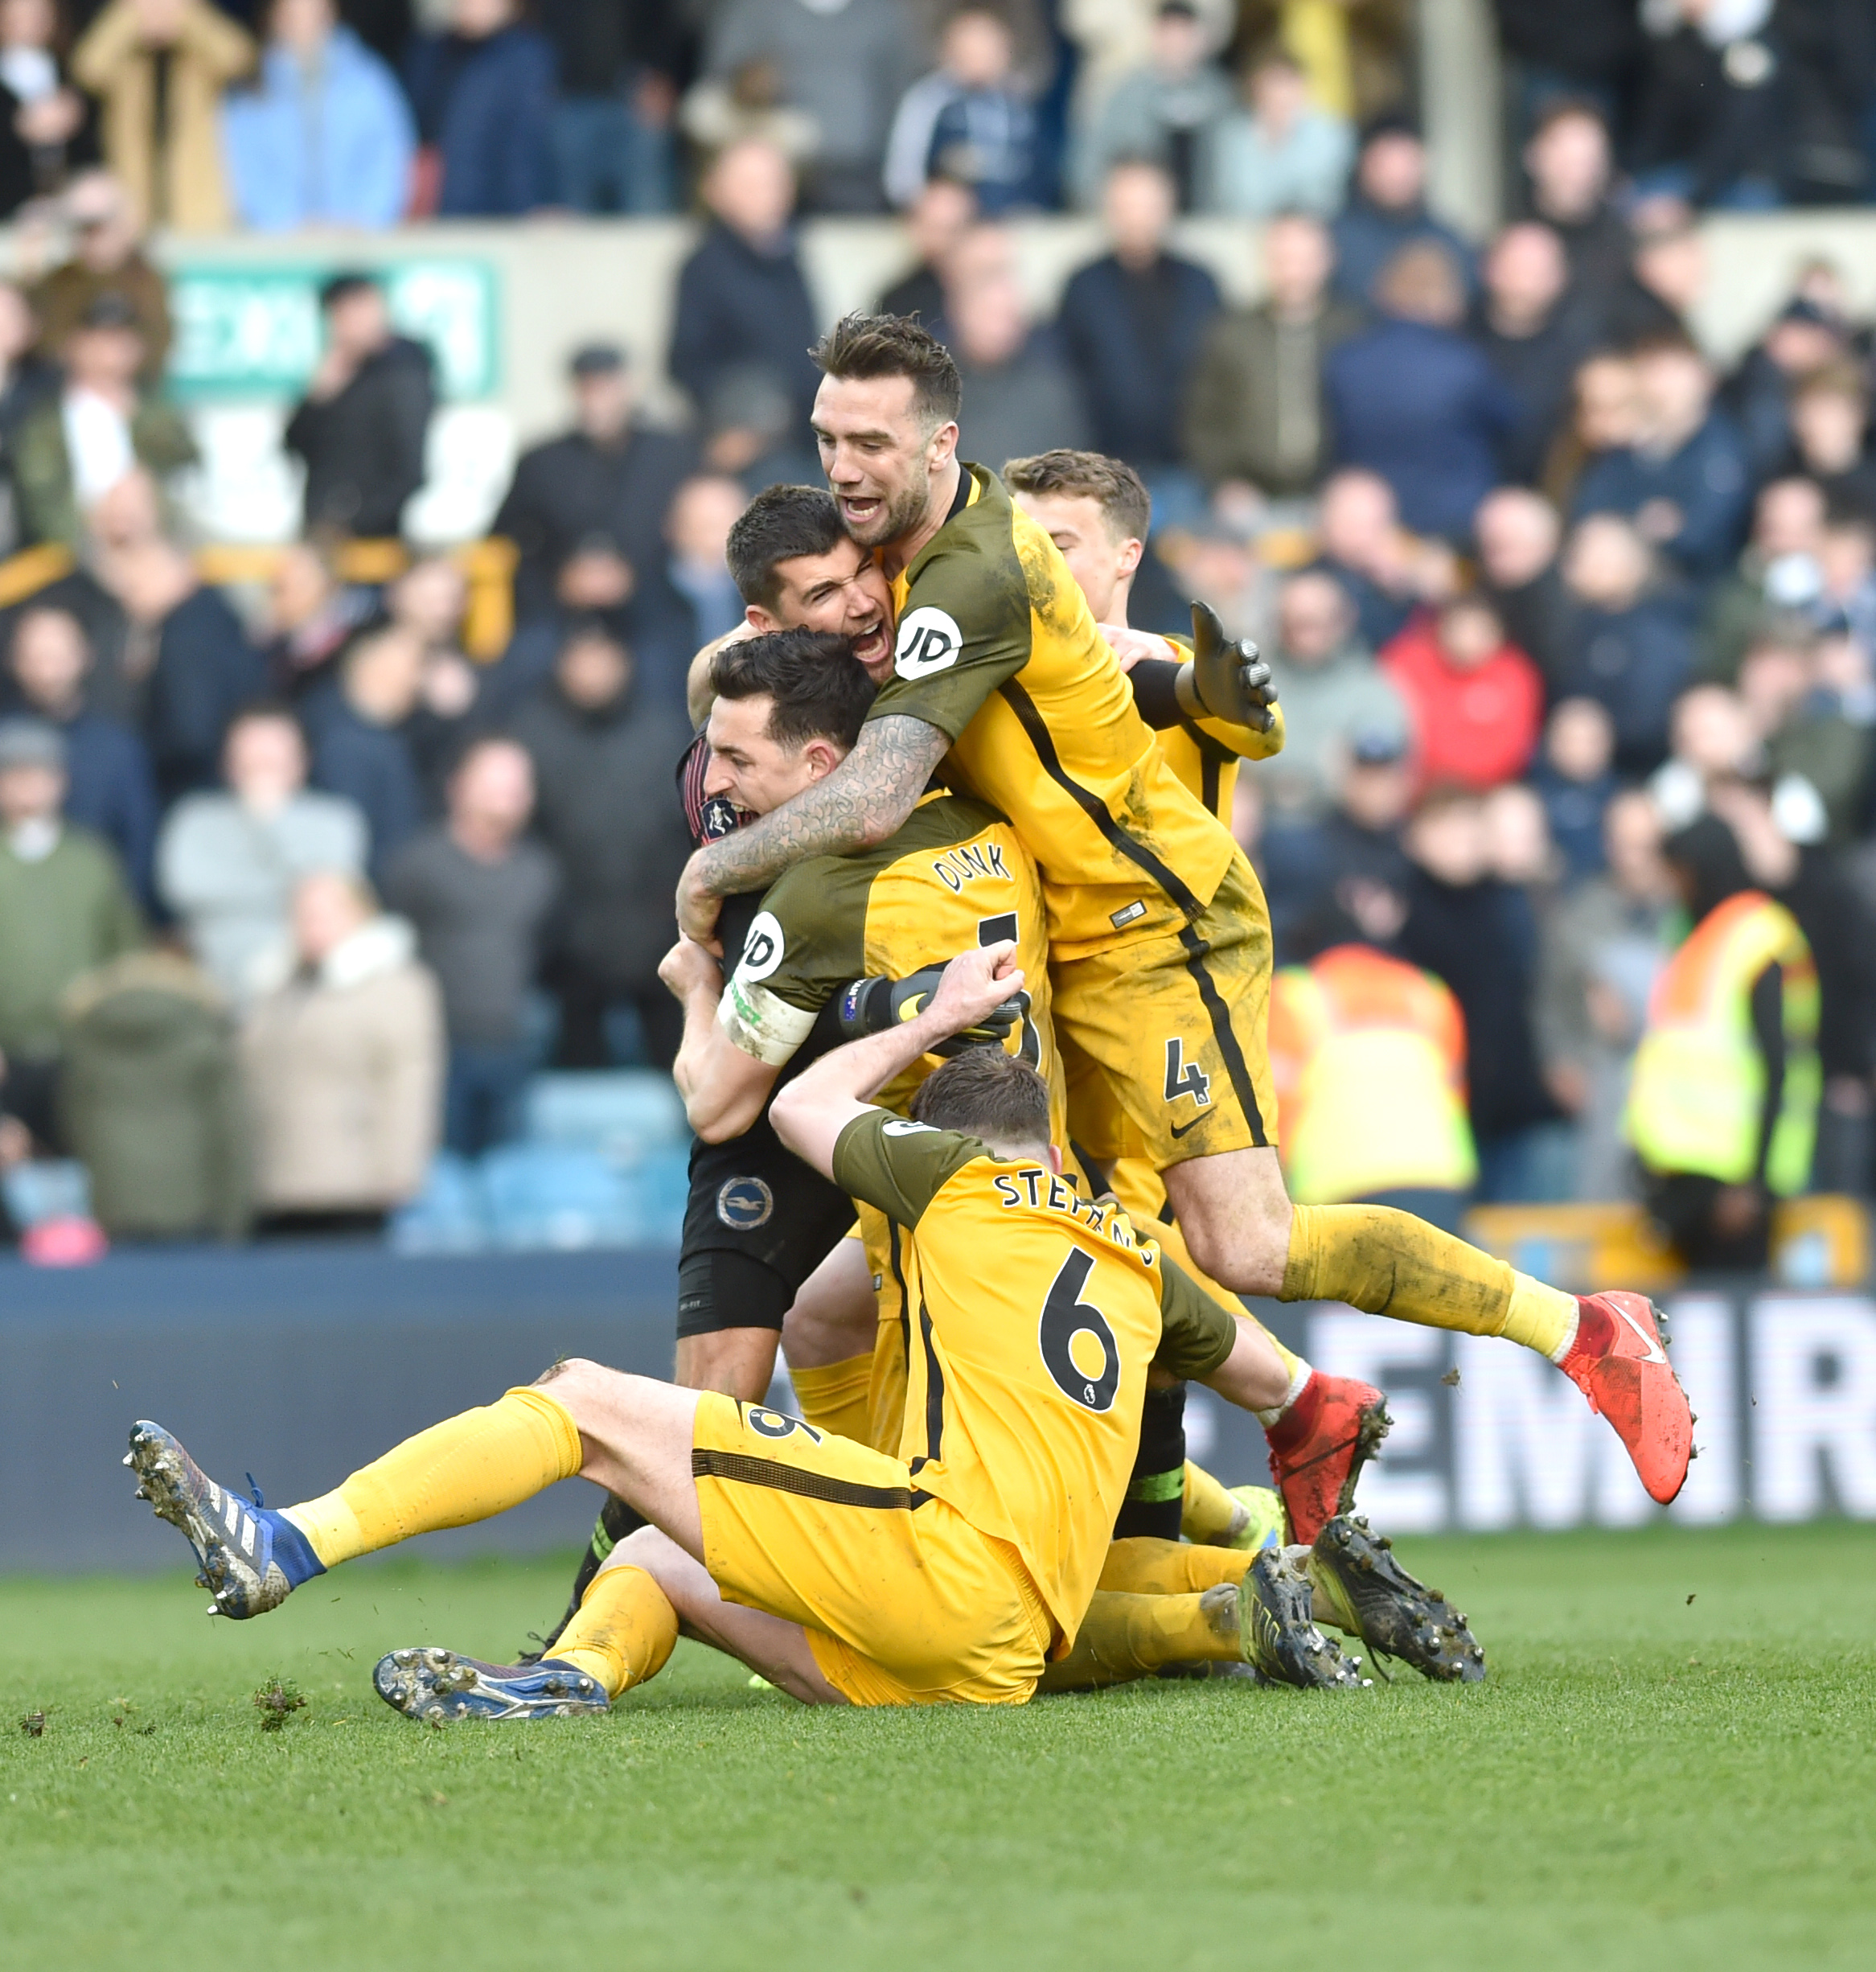 Albion draw Manchester City in FA Cup semi-final